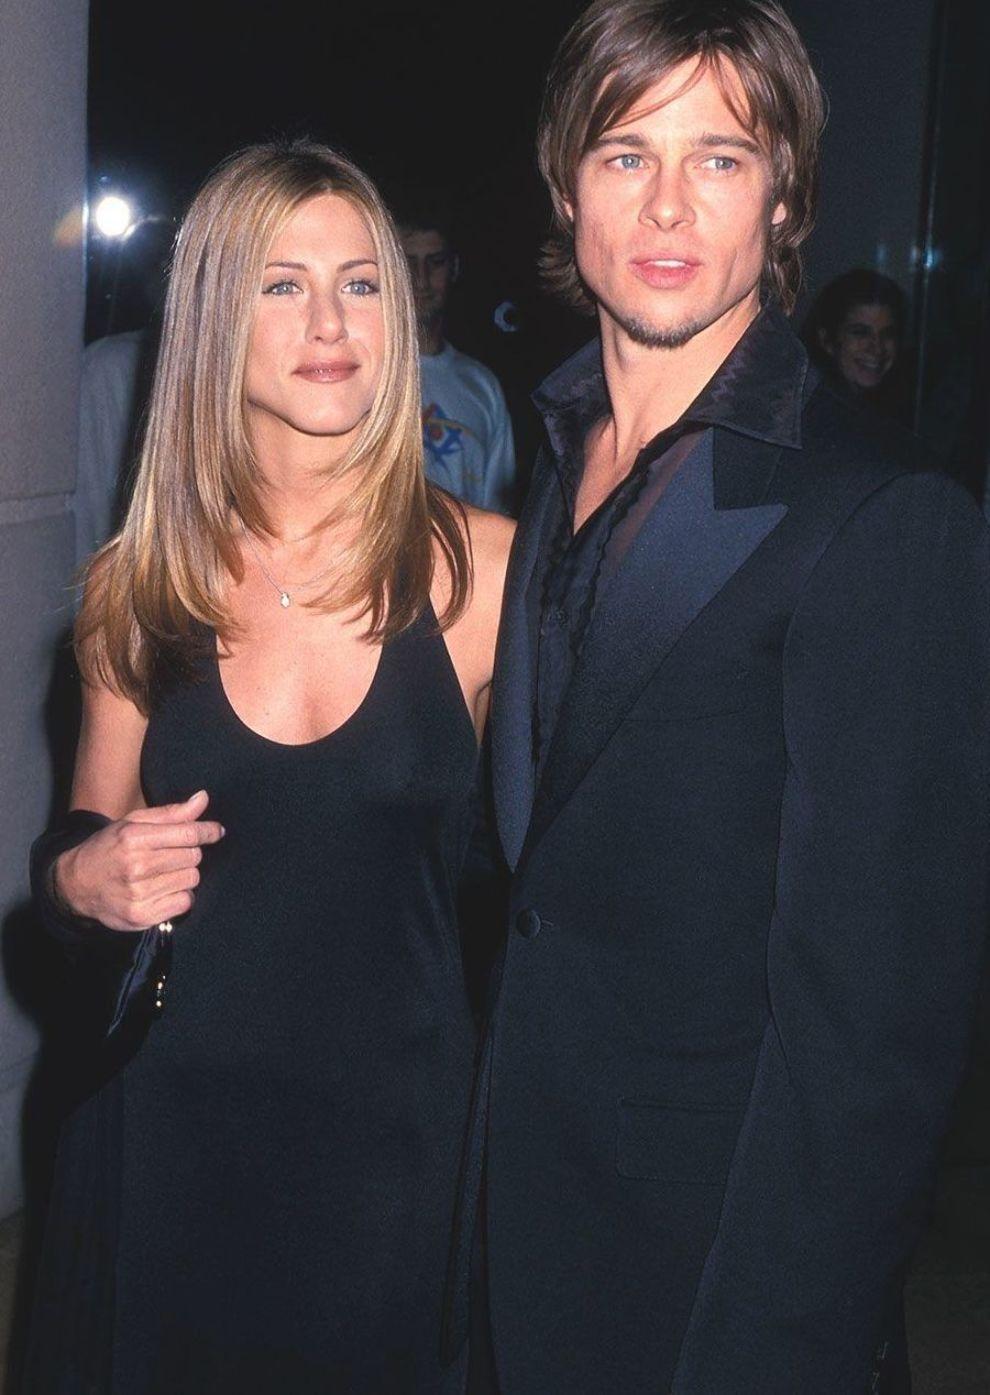 Brad Pitt A Timeline Of The Women The Actor S Dated From Sinitta To Angelina Jolie Cosmopolitanuk Em 2020 Casais Famosos Casal Meninas